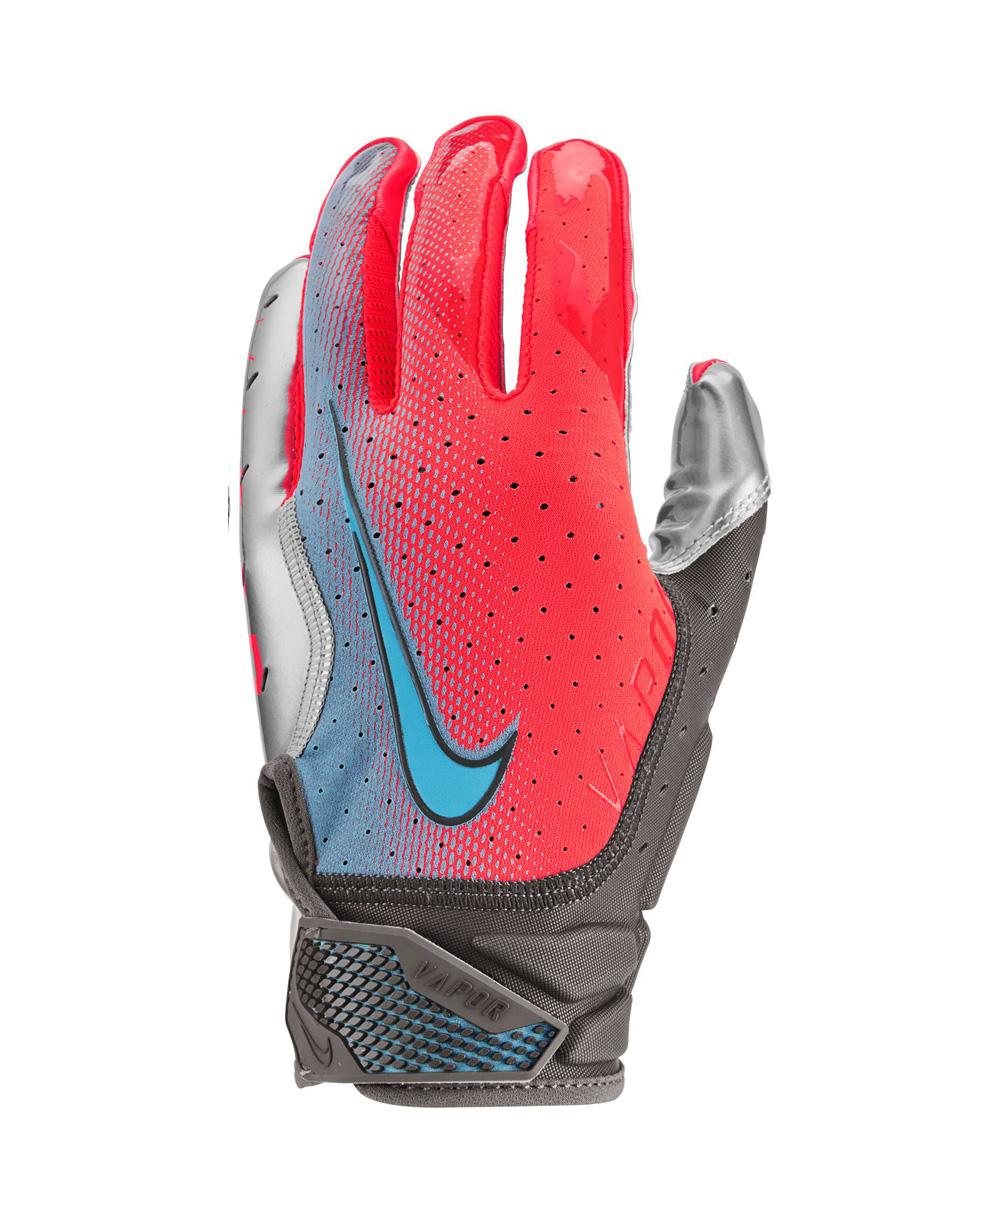 Vapor Jet 6 Herren American Football Handschuhe Crimson/Metallic Silver/Baltic Blue